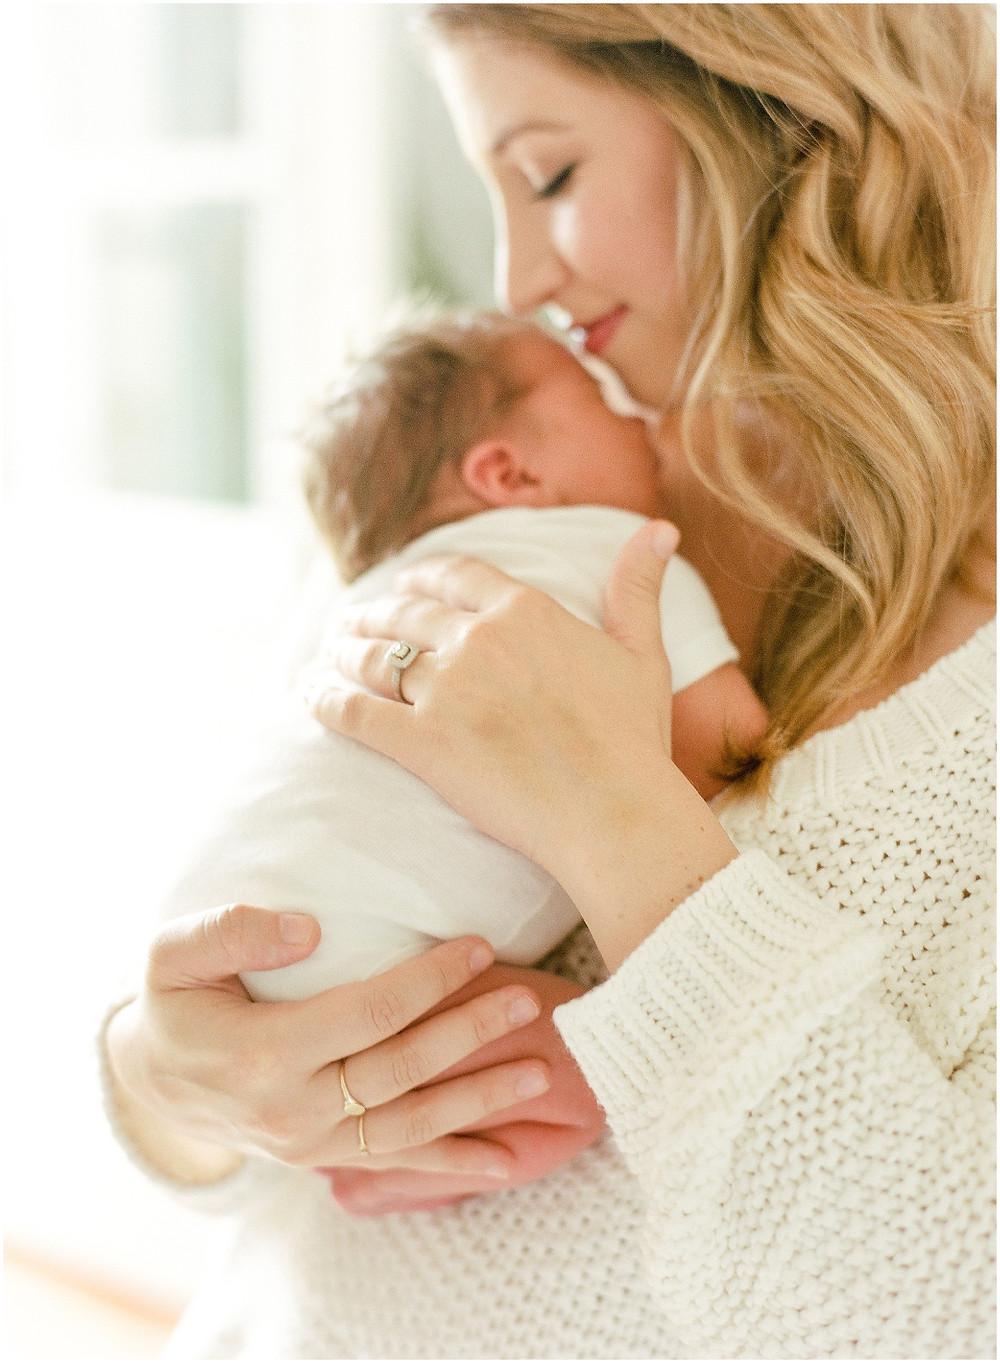 San Francisco newborn session by lifestyle fine art photographer Torrey Fox